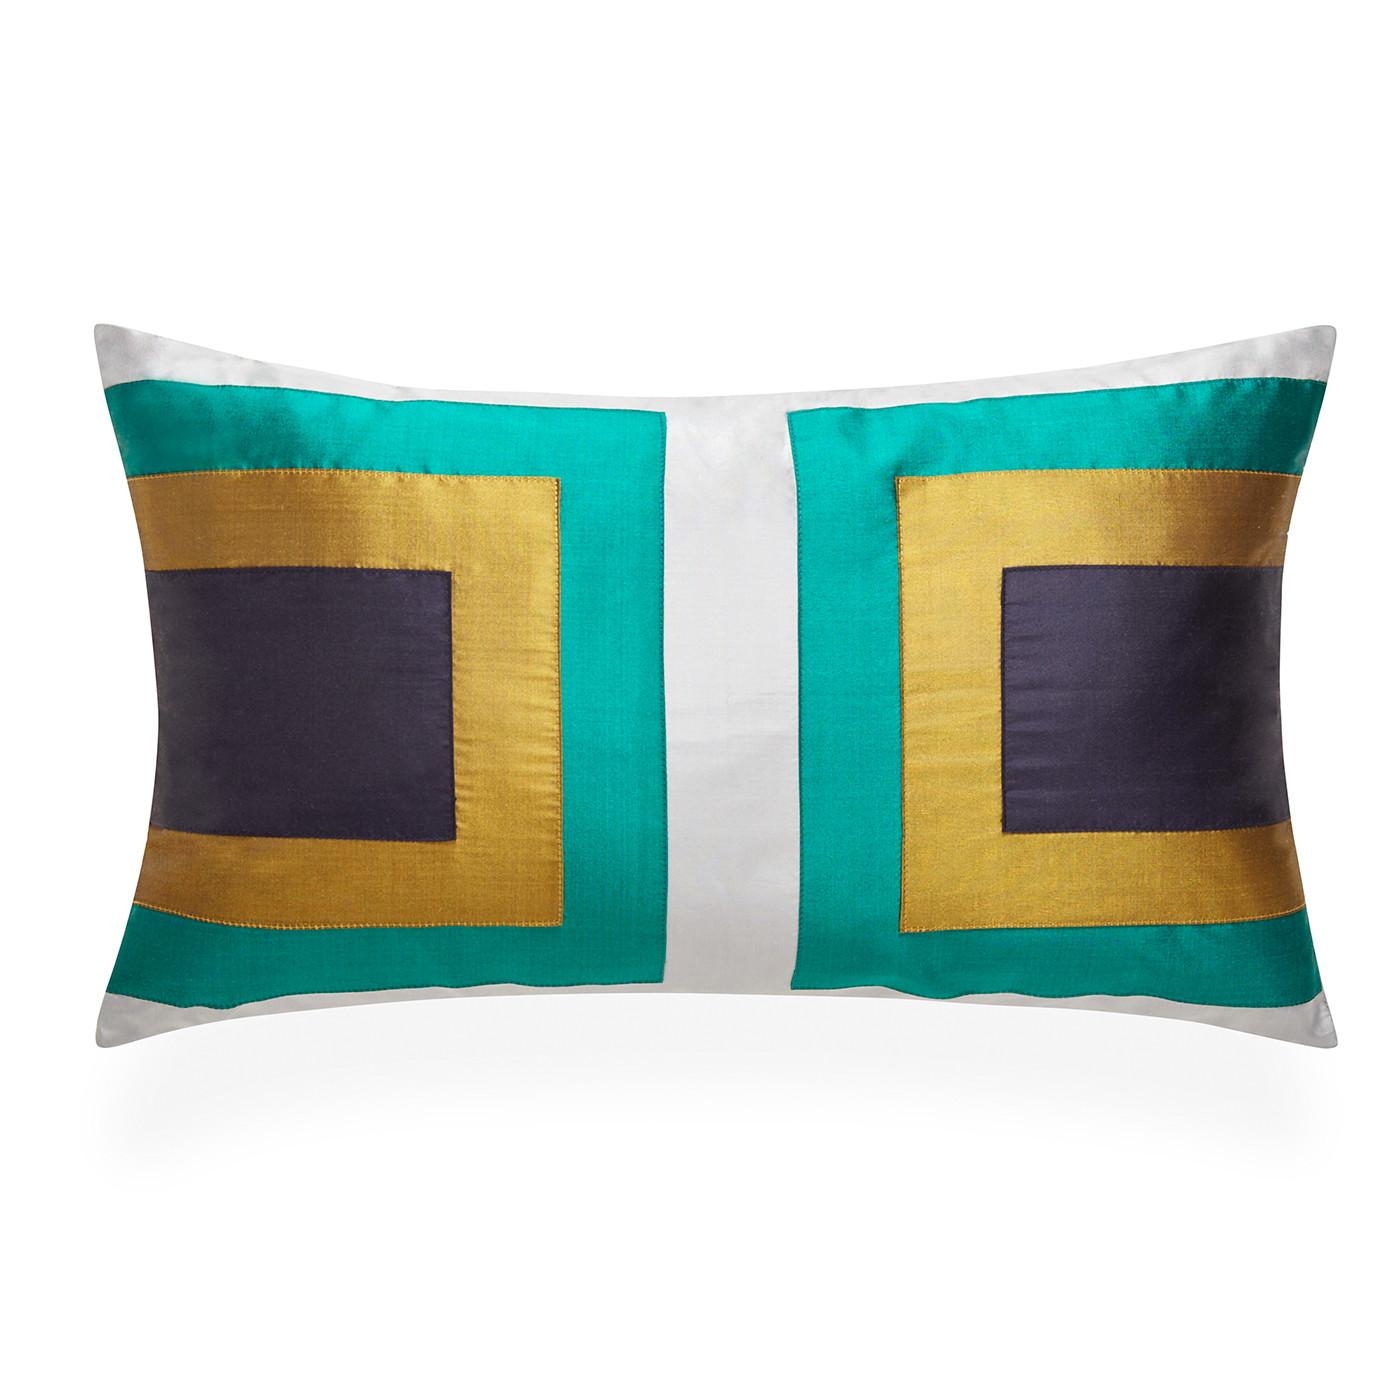 Jonathan Adler Siam Zip Emerald Lumbar Pillow